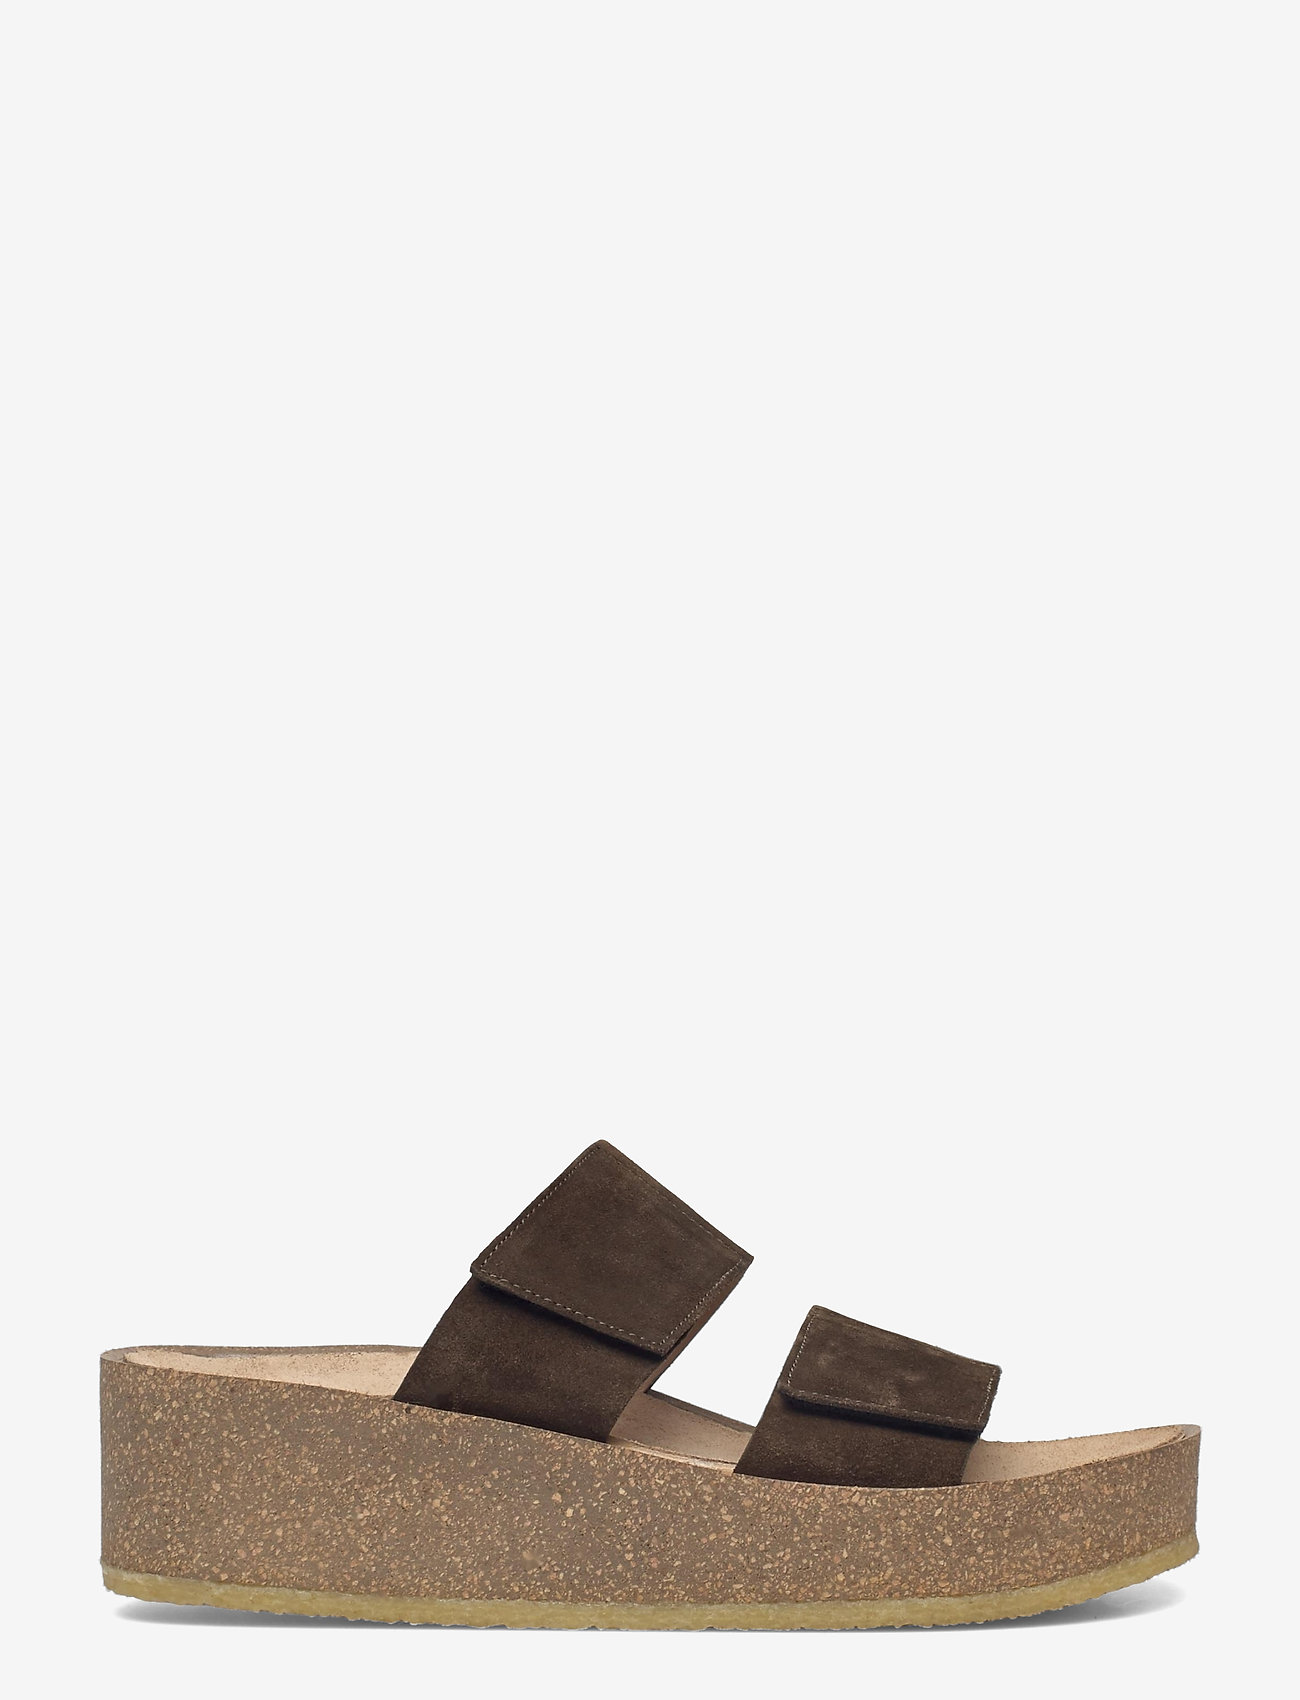 ANGULUS - Sandals - flat - open toe - op - sandalen mit absatz - 2214 dark olive - 1